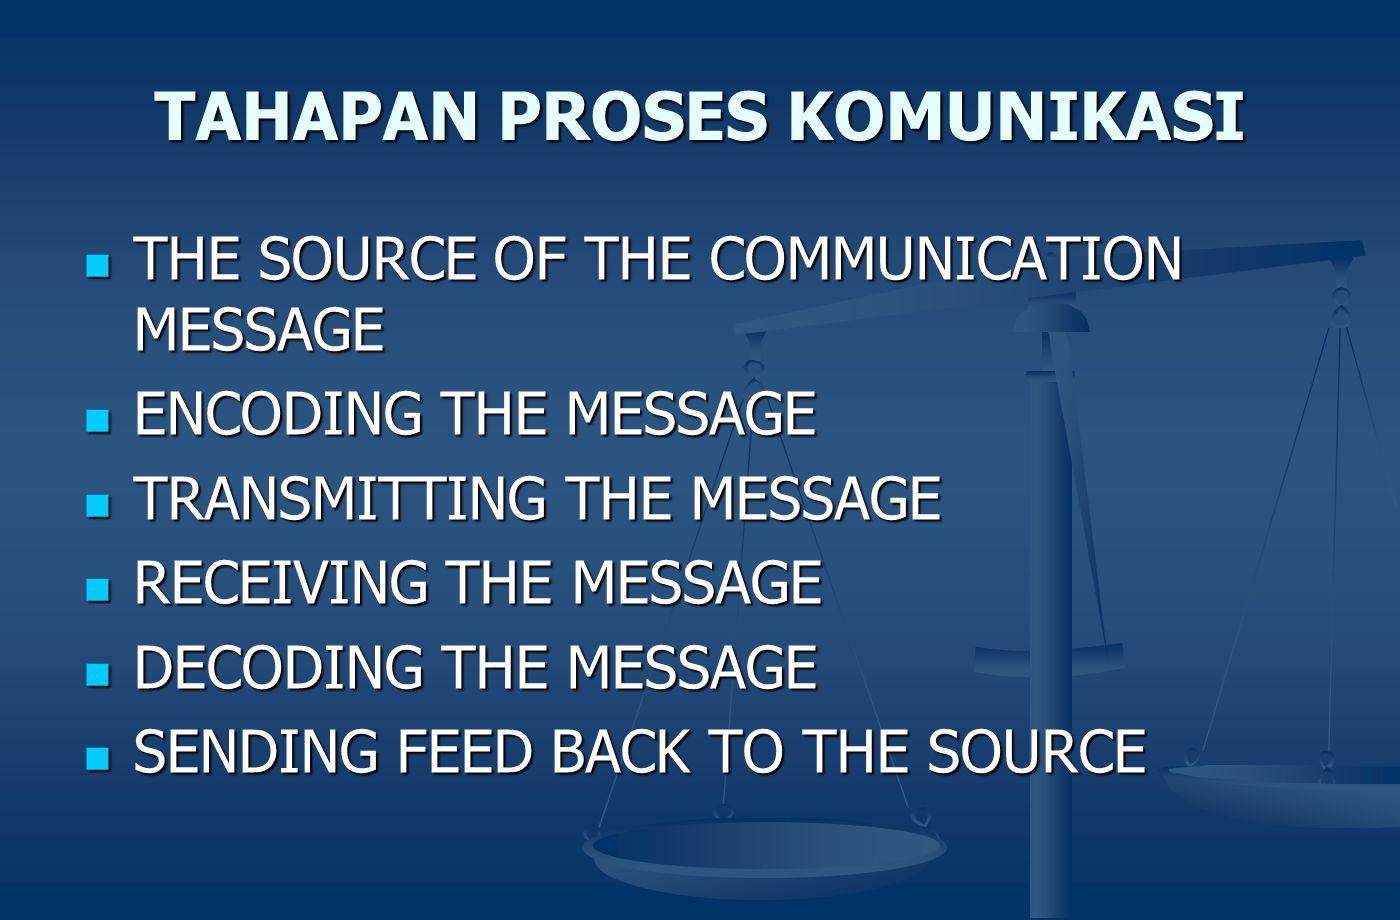 TAHAPAN PROSES KOMUNIKASI THE SOURCE OF THE COMMUNICATION MESSAGE THE SOURCE OF THE COMMUNICATION MESSAGE ENCODING THE MESSAGE ENCODING THE MESSAGE TR